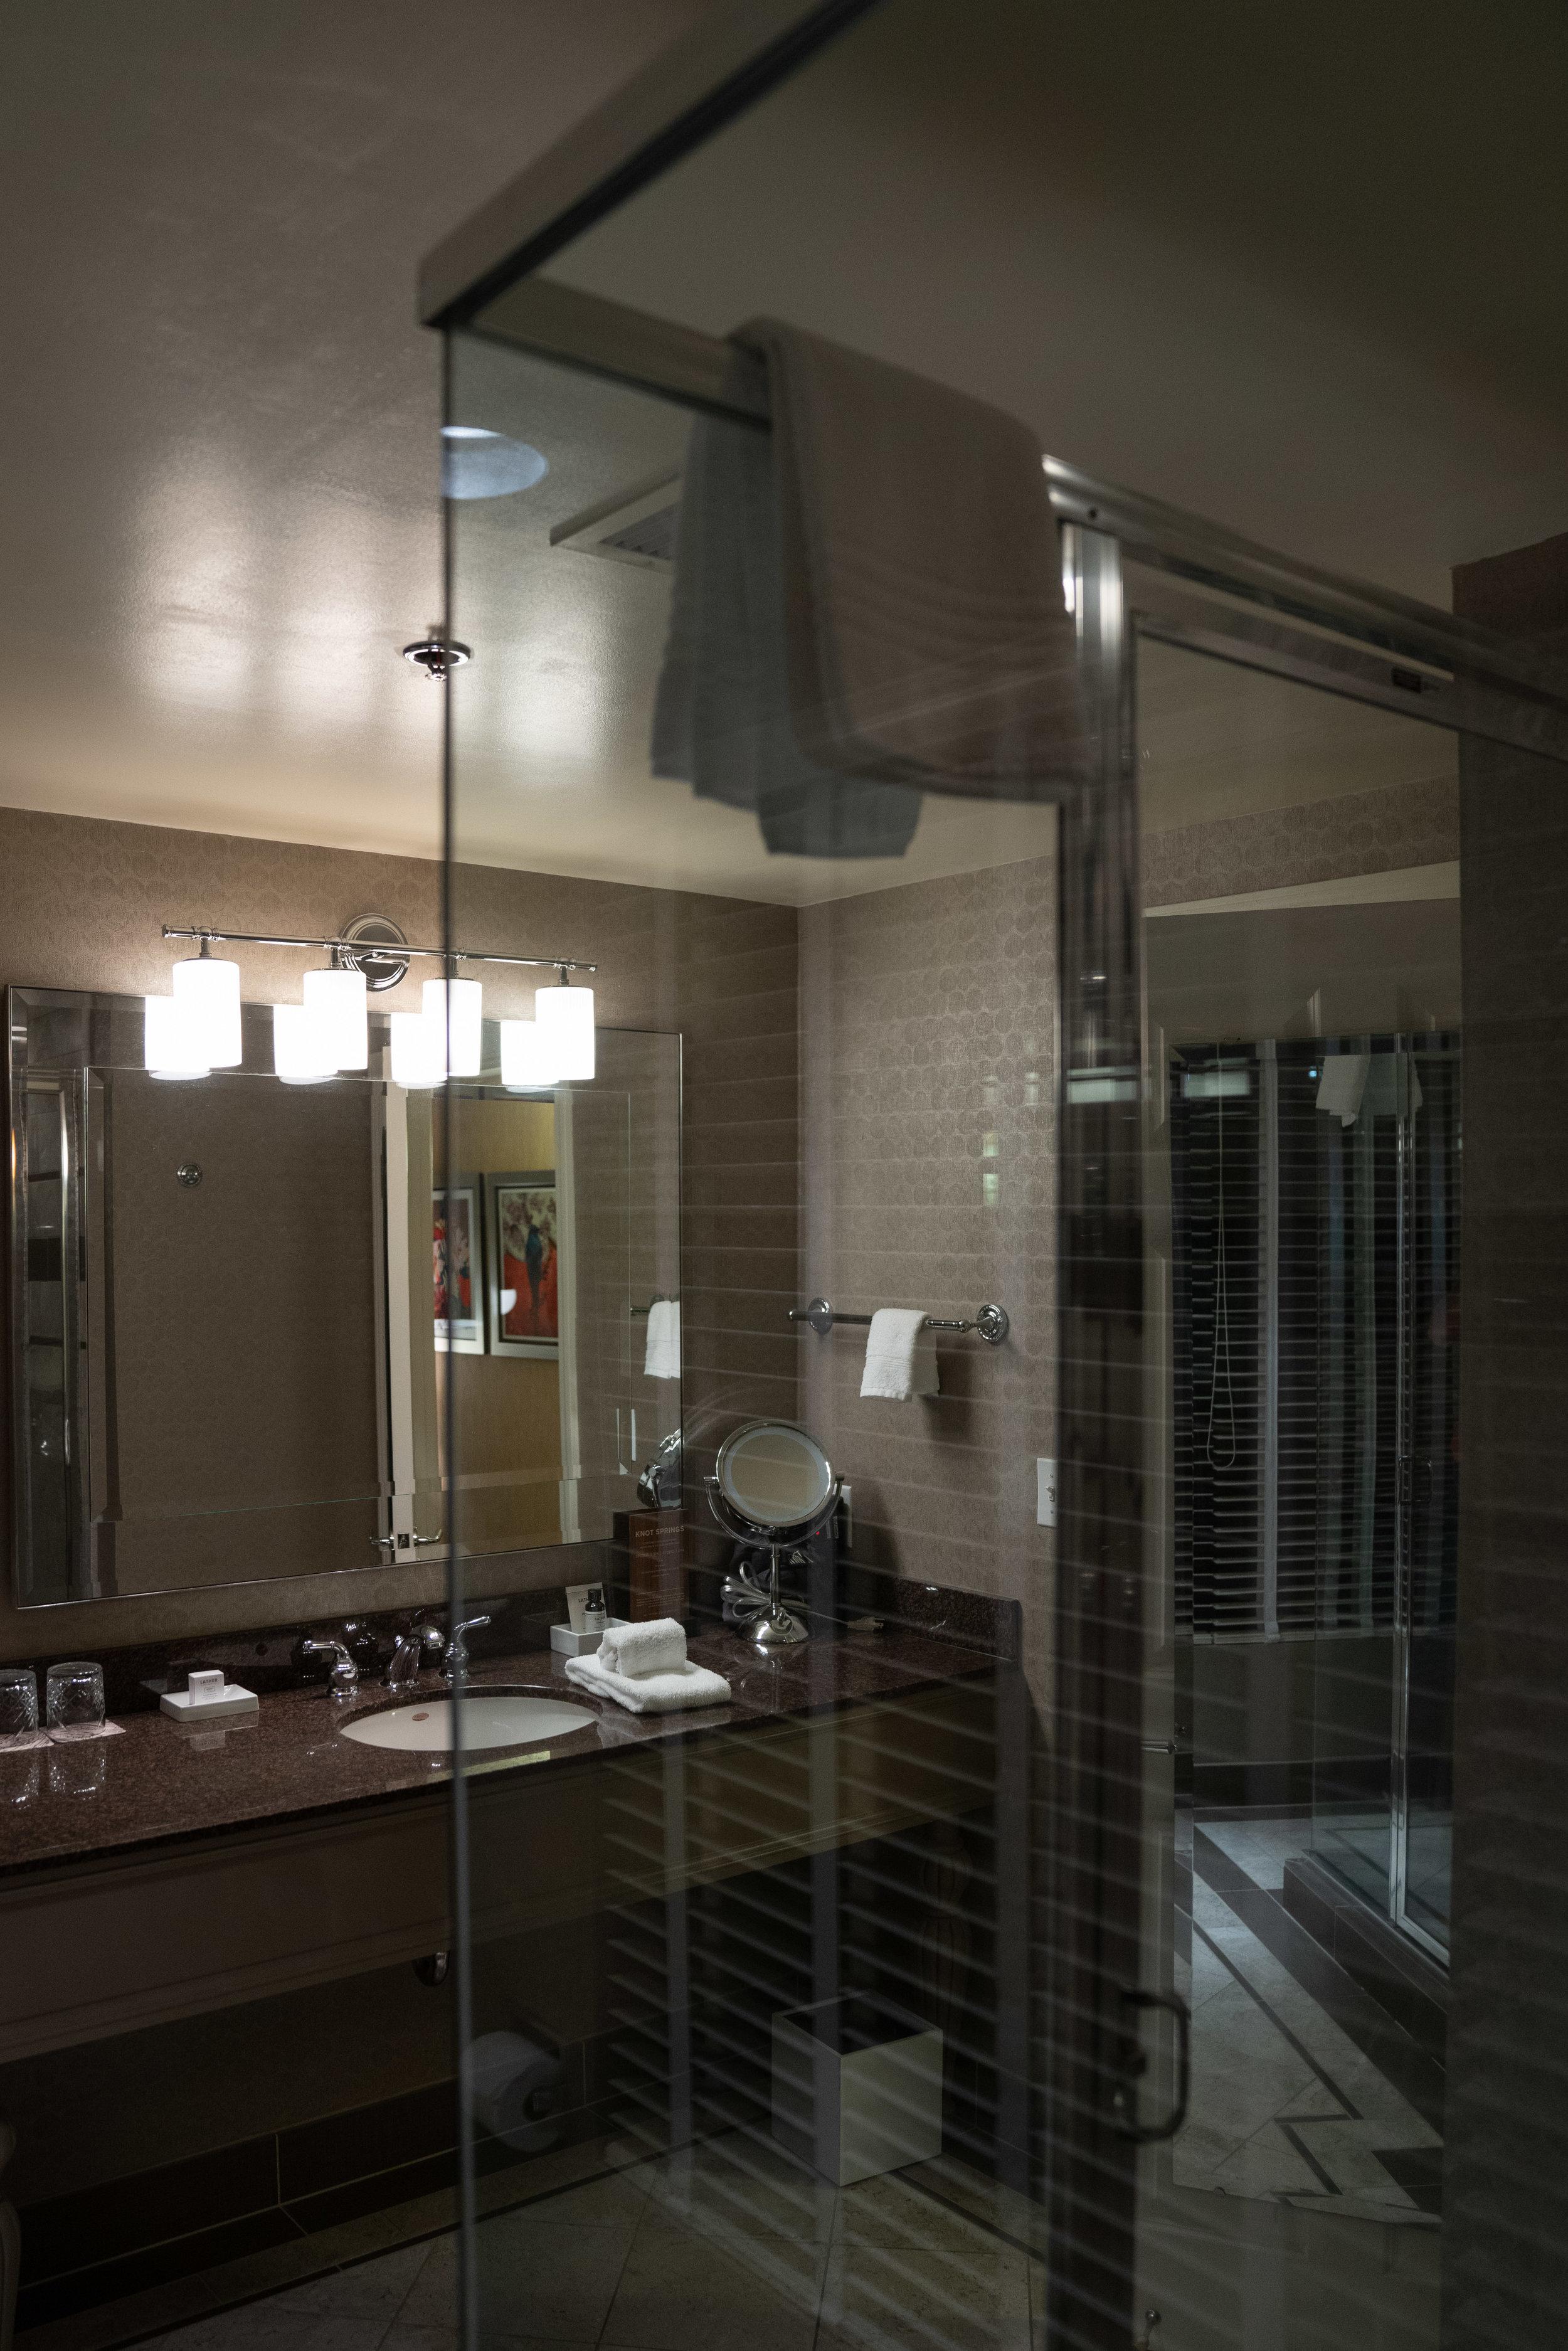 Dossier-Hotel-Stenberg-05741.jpg